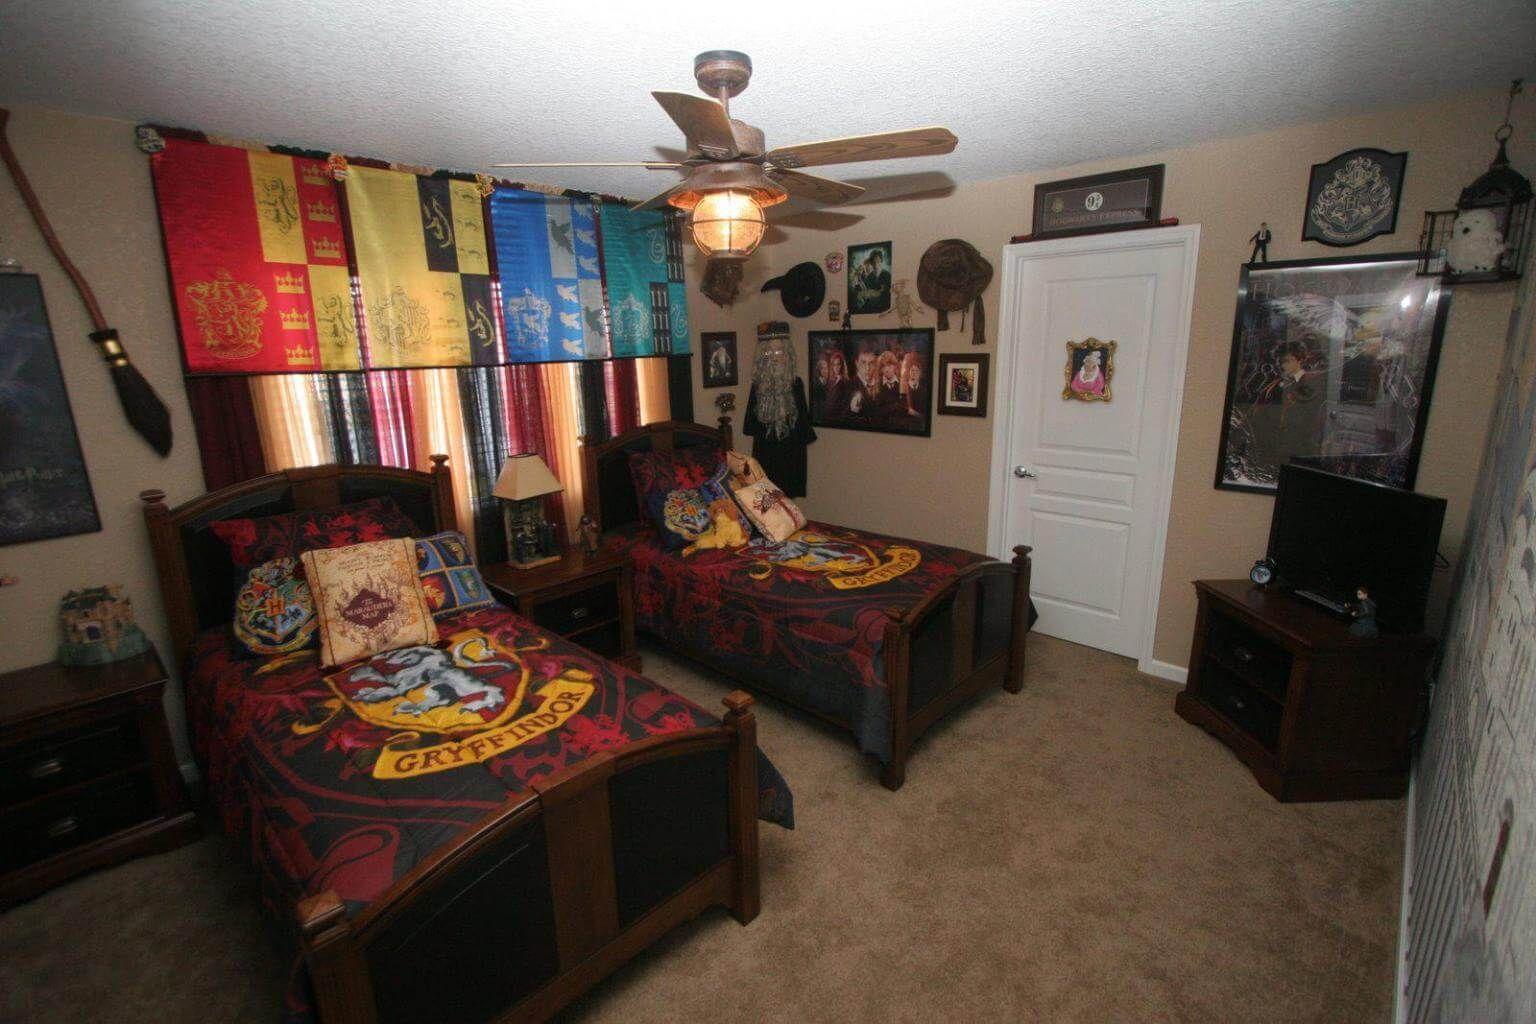 10 Bedroom Tv Stand Ideas 2021 Happy And Homey Harry Potter Room Decor Harry Potter Bedroom Harry Potter Bedroom Decor